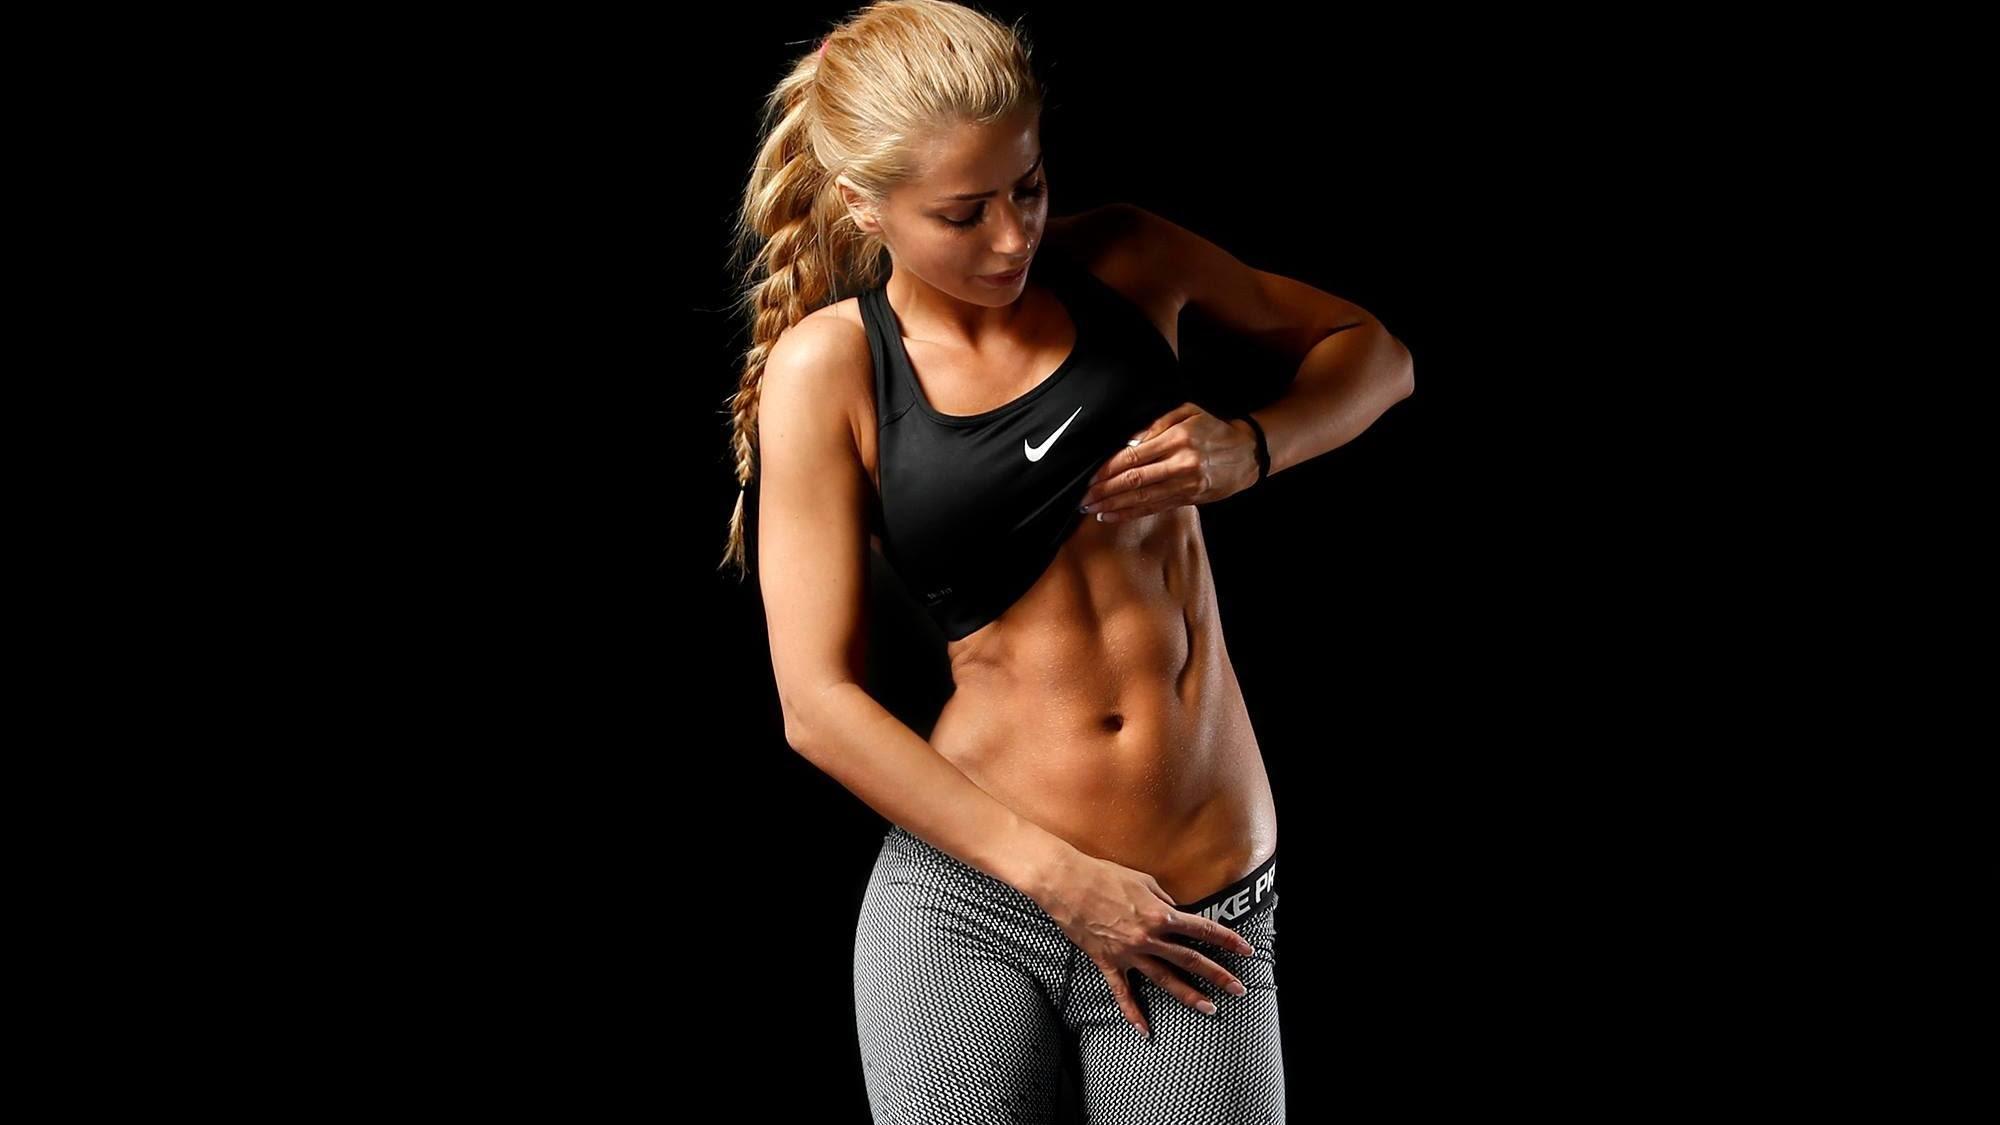 maxresdefault Womens Fitness. 2